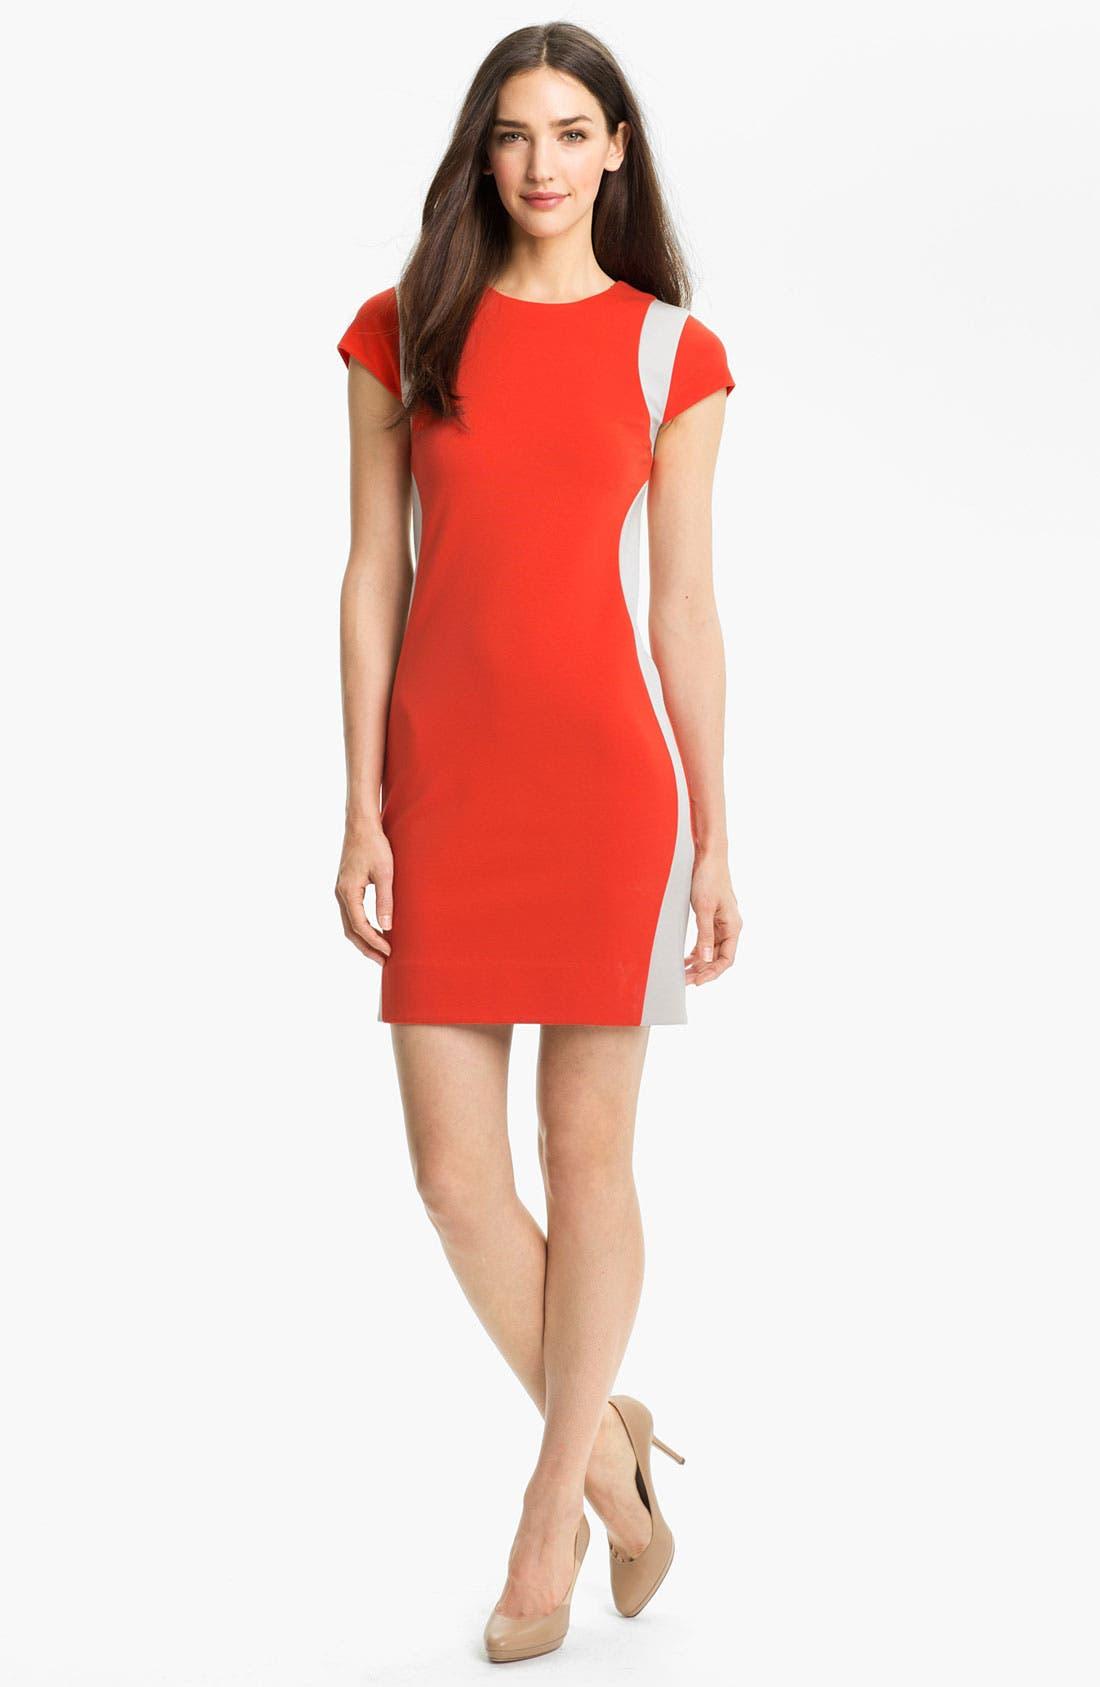 Main Image - Diane von Furstenberg 'Pele' Knit Sheath Dress